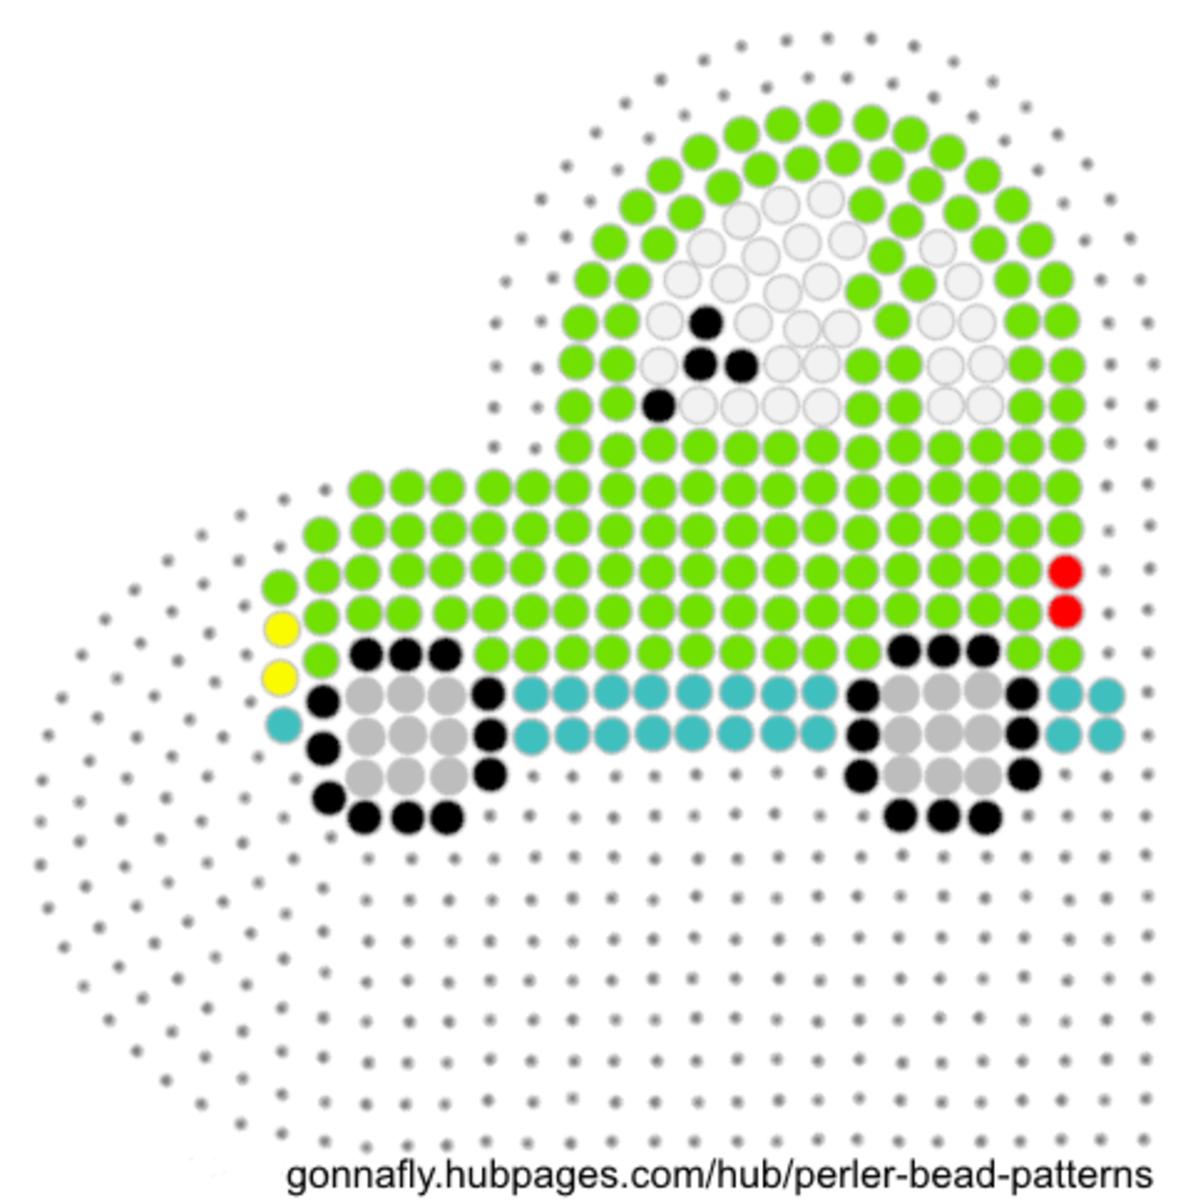 Vehicle Perler Bead Patterns